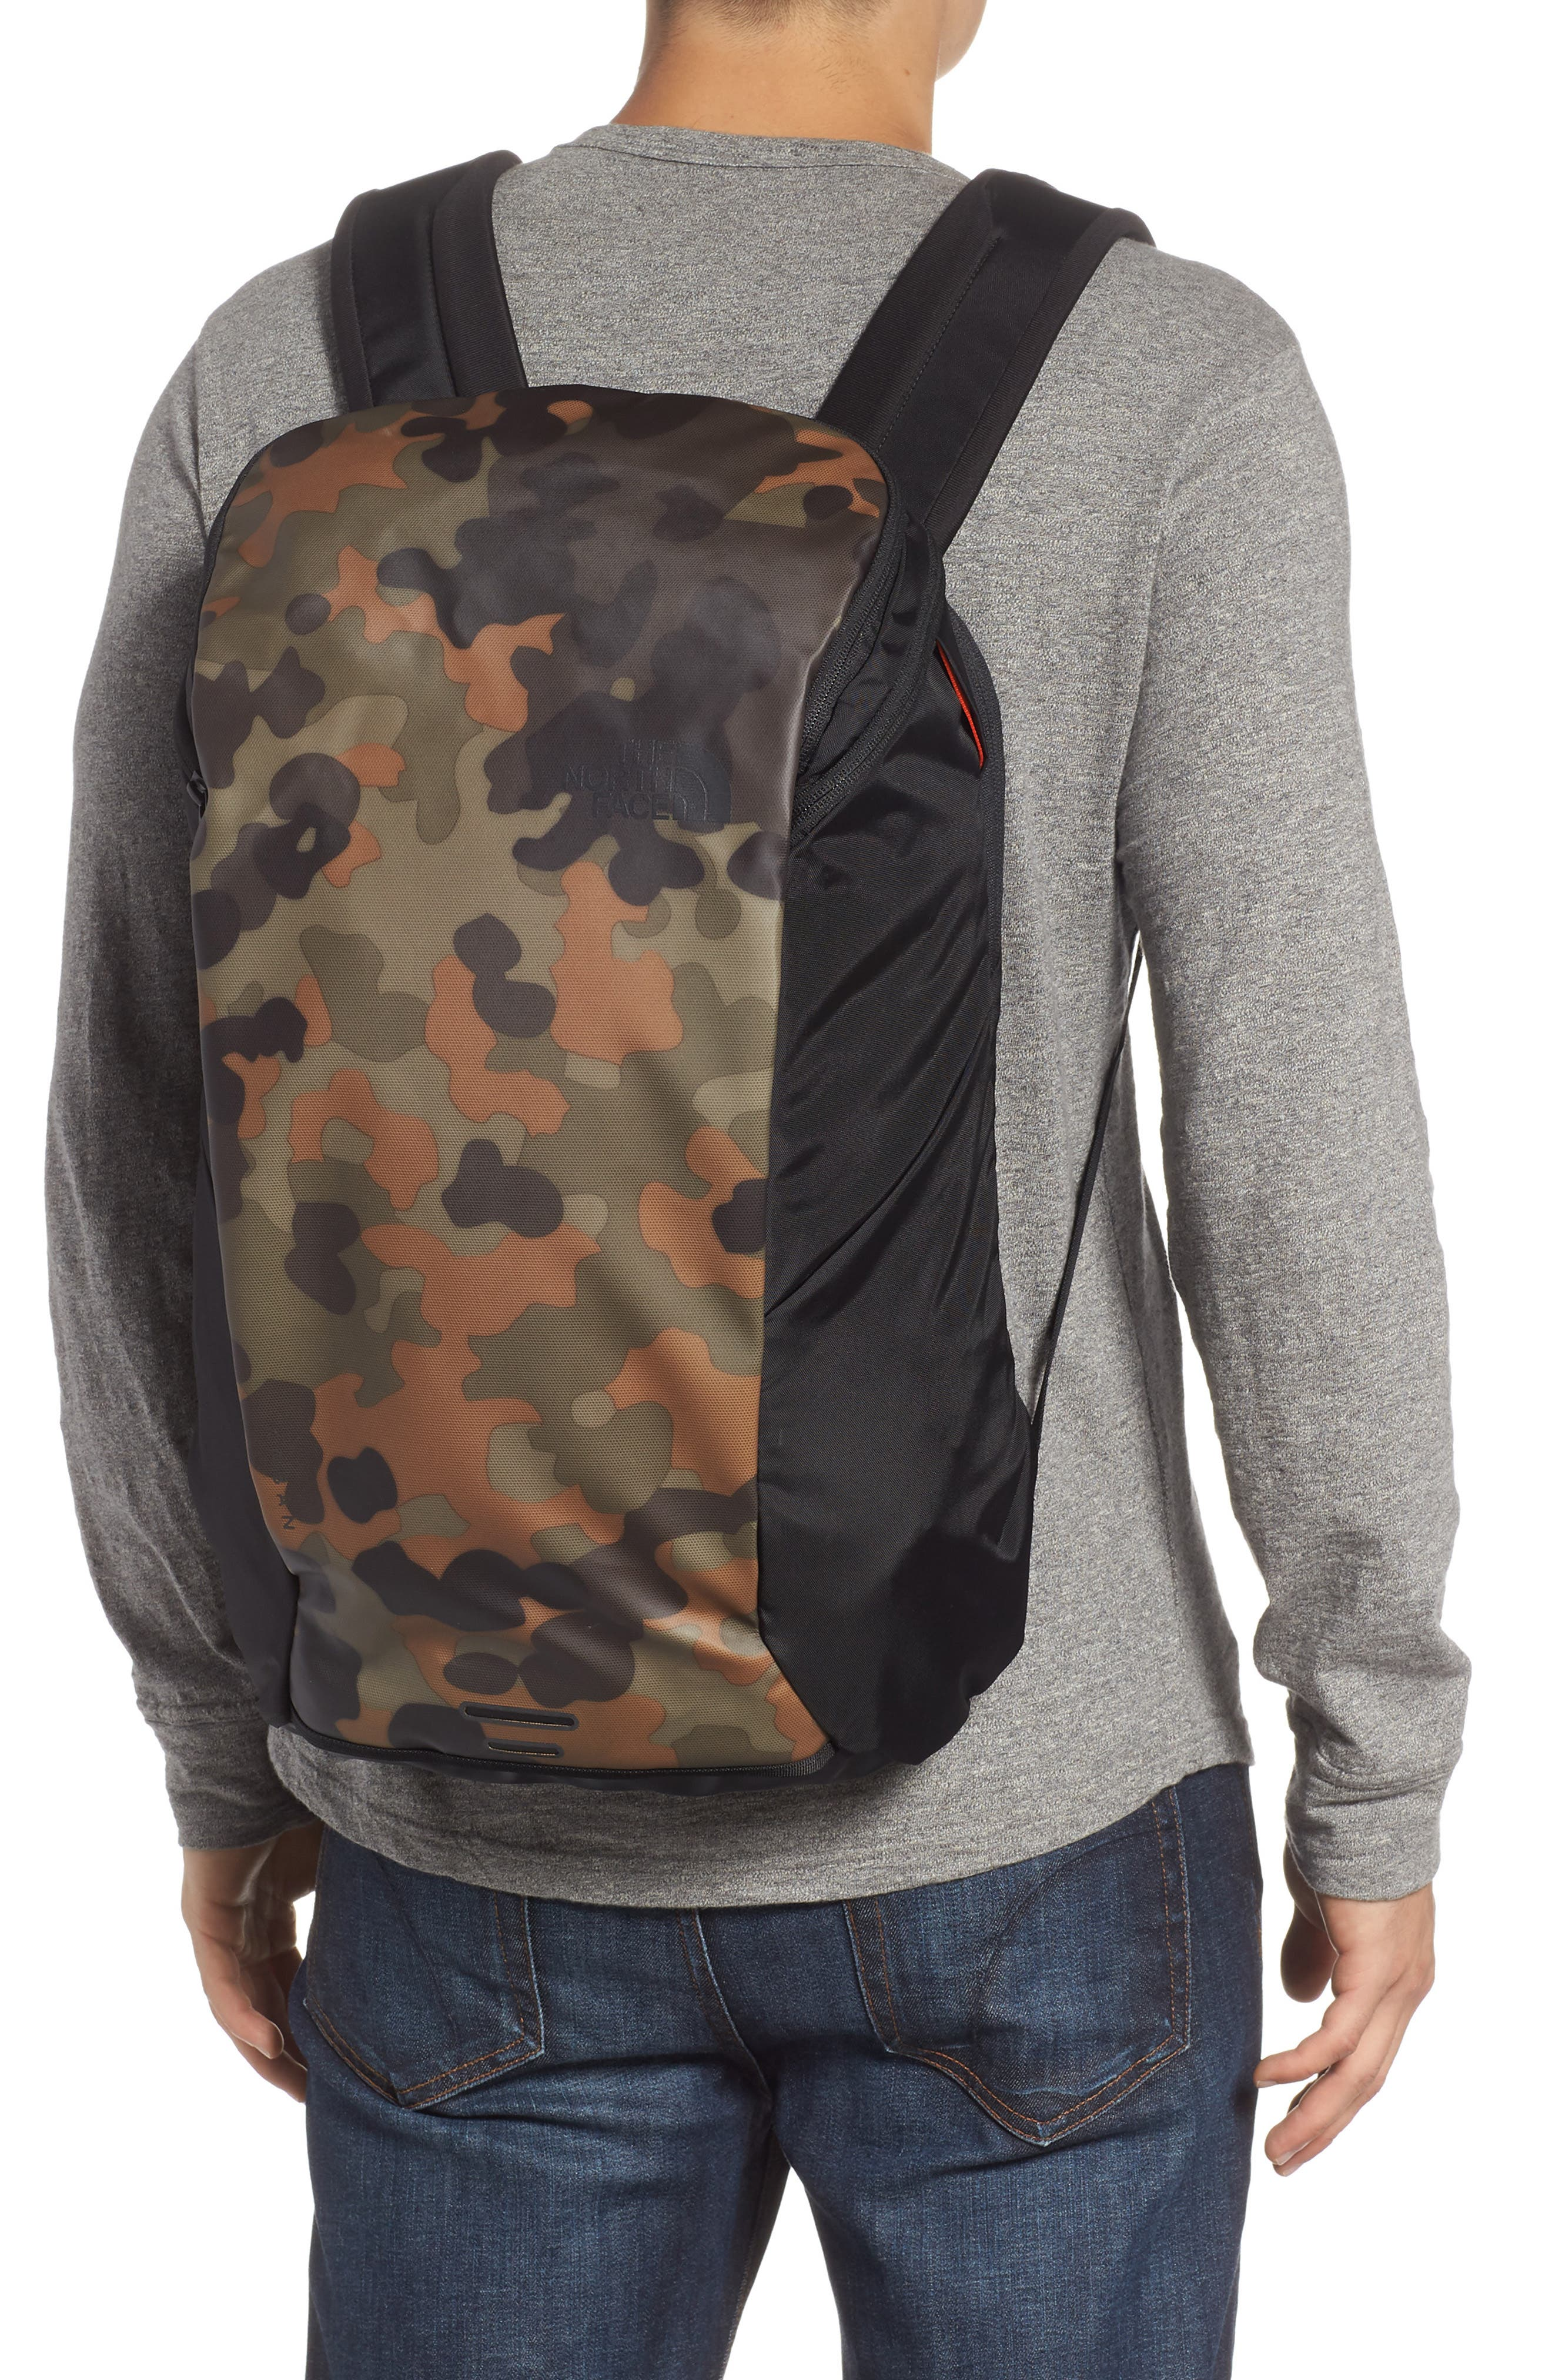 Ka-Ban Backpack,                             Alternate thumbnail 2, color,                             TAUPE GREEN/ MACROFLECK PRINT